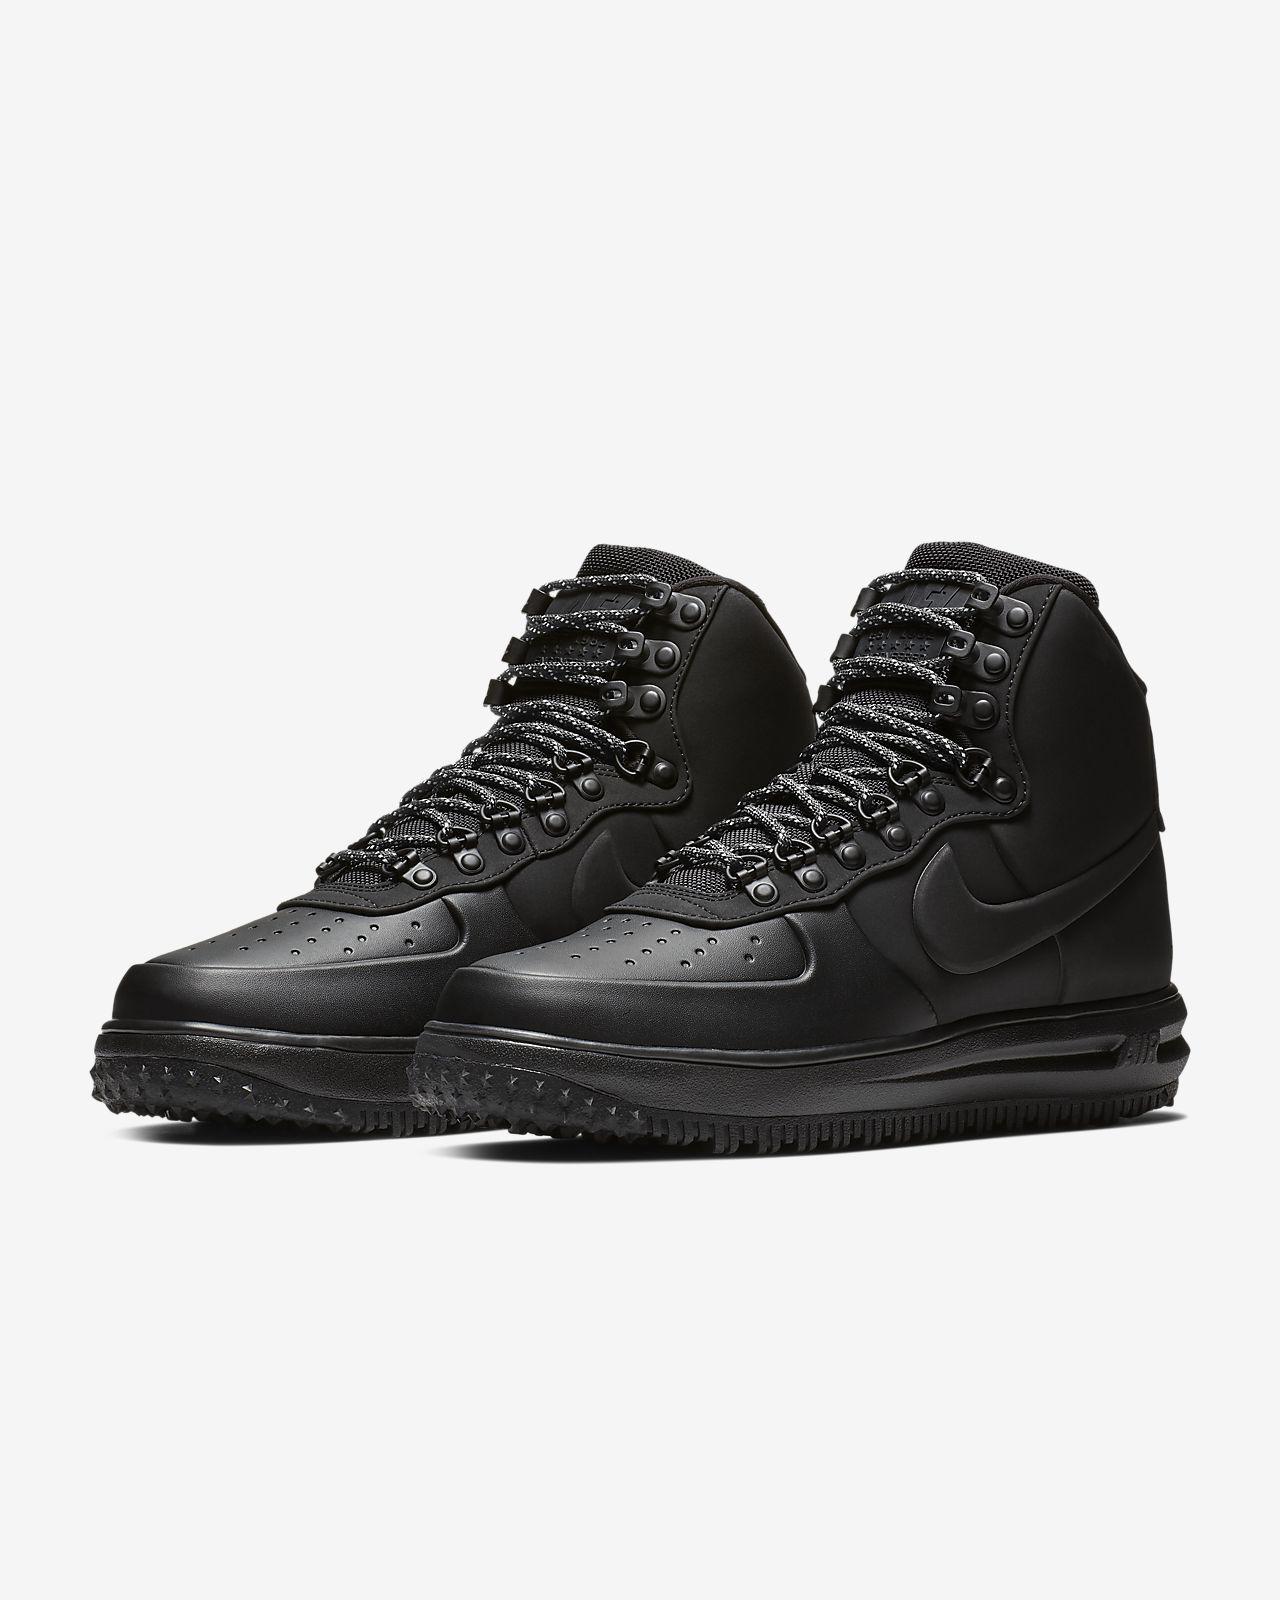 Uomo Nike Air Force 1 Mid Duck Boot Nero | Sneakers retro